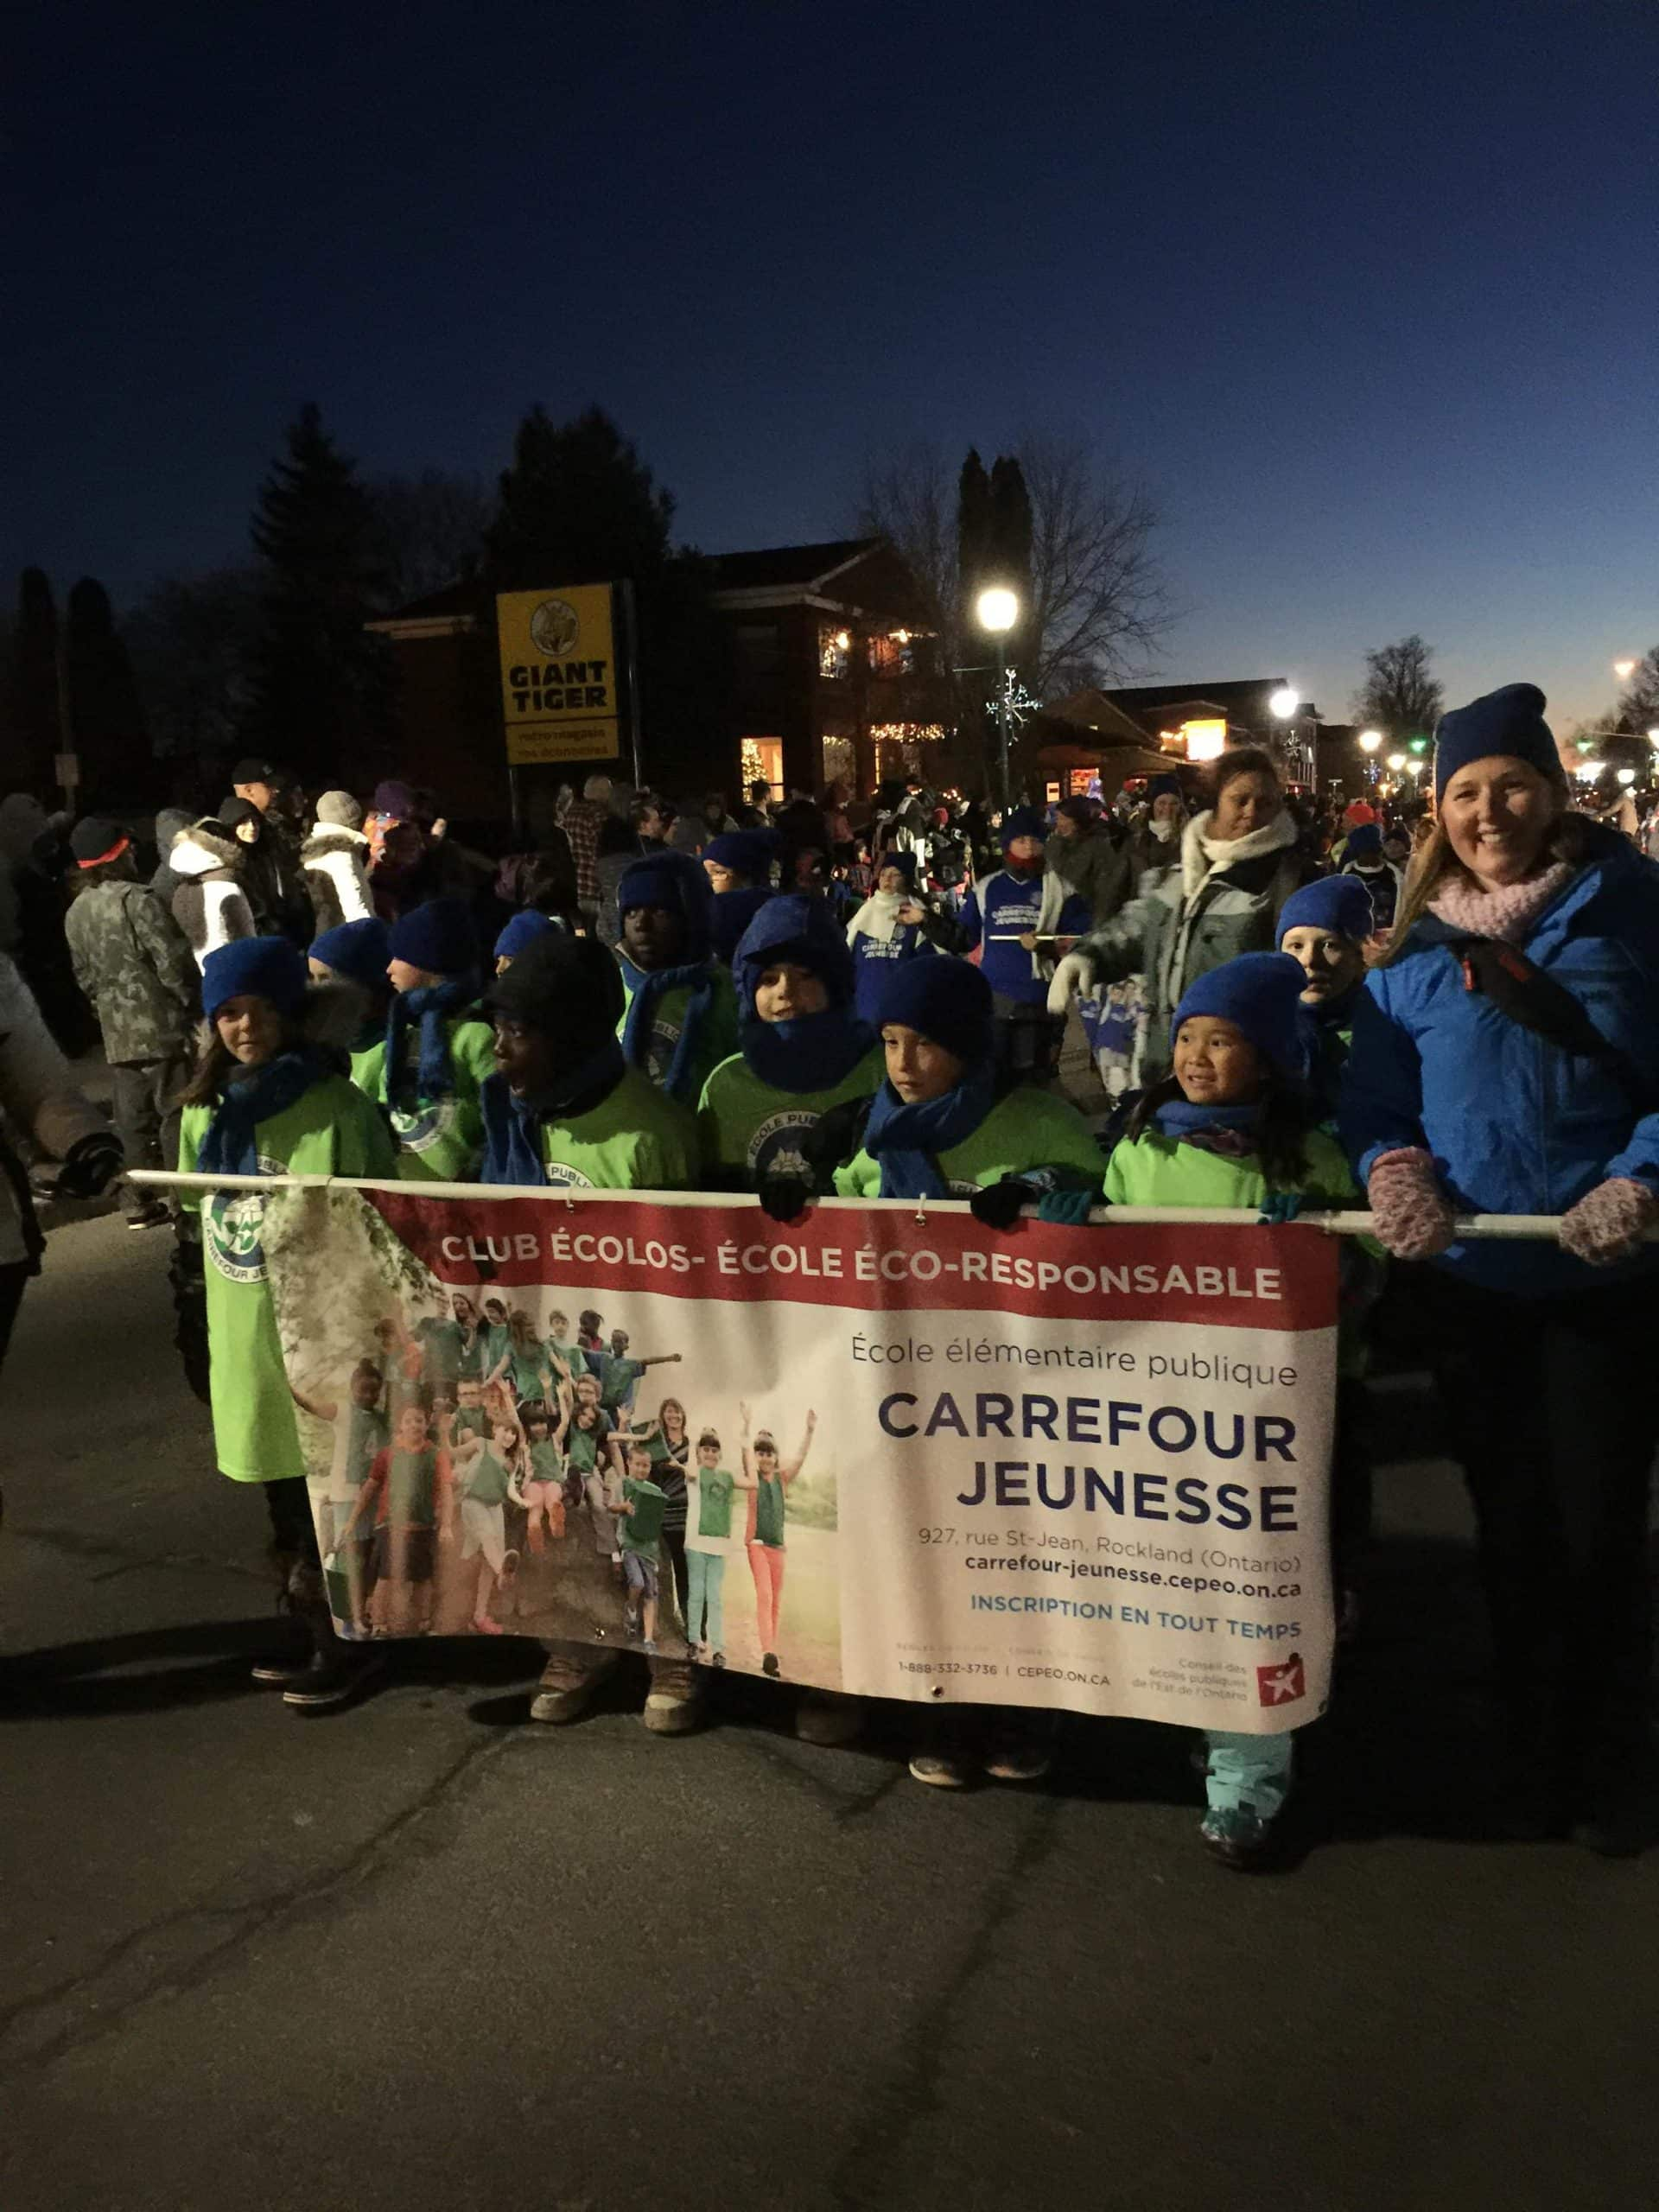 Carrefour-Jeunesse_parade